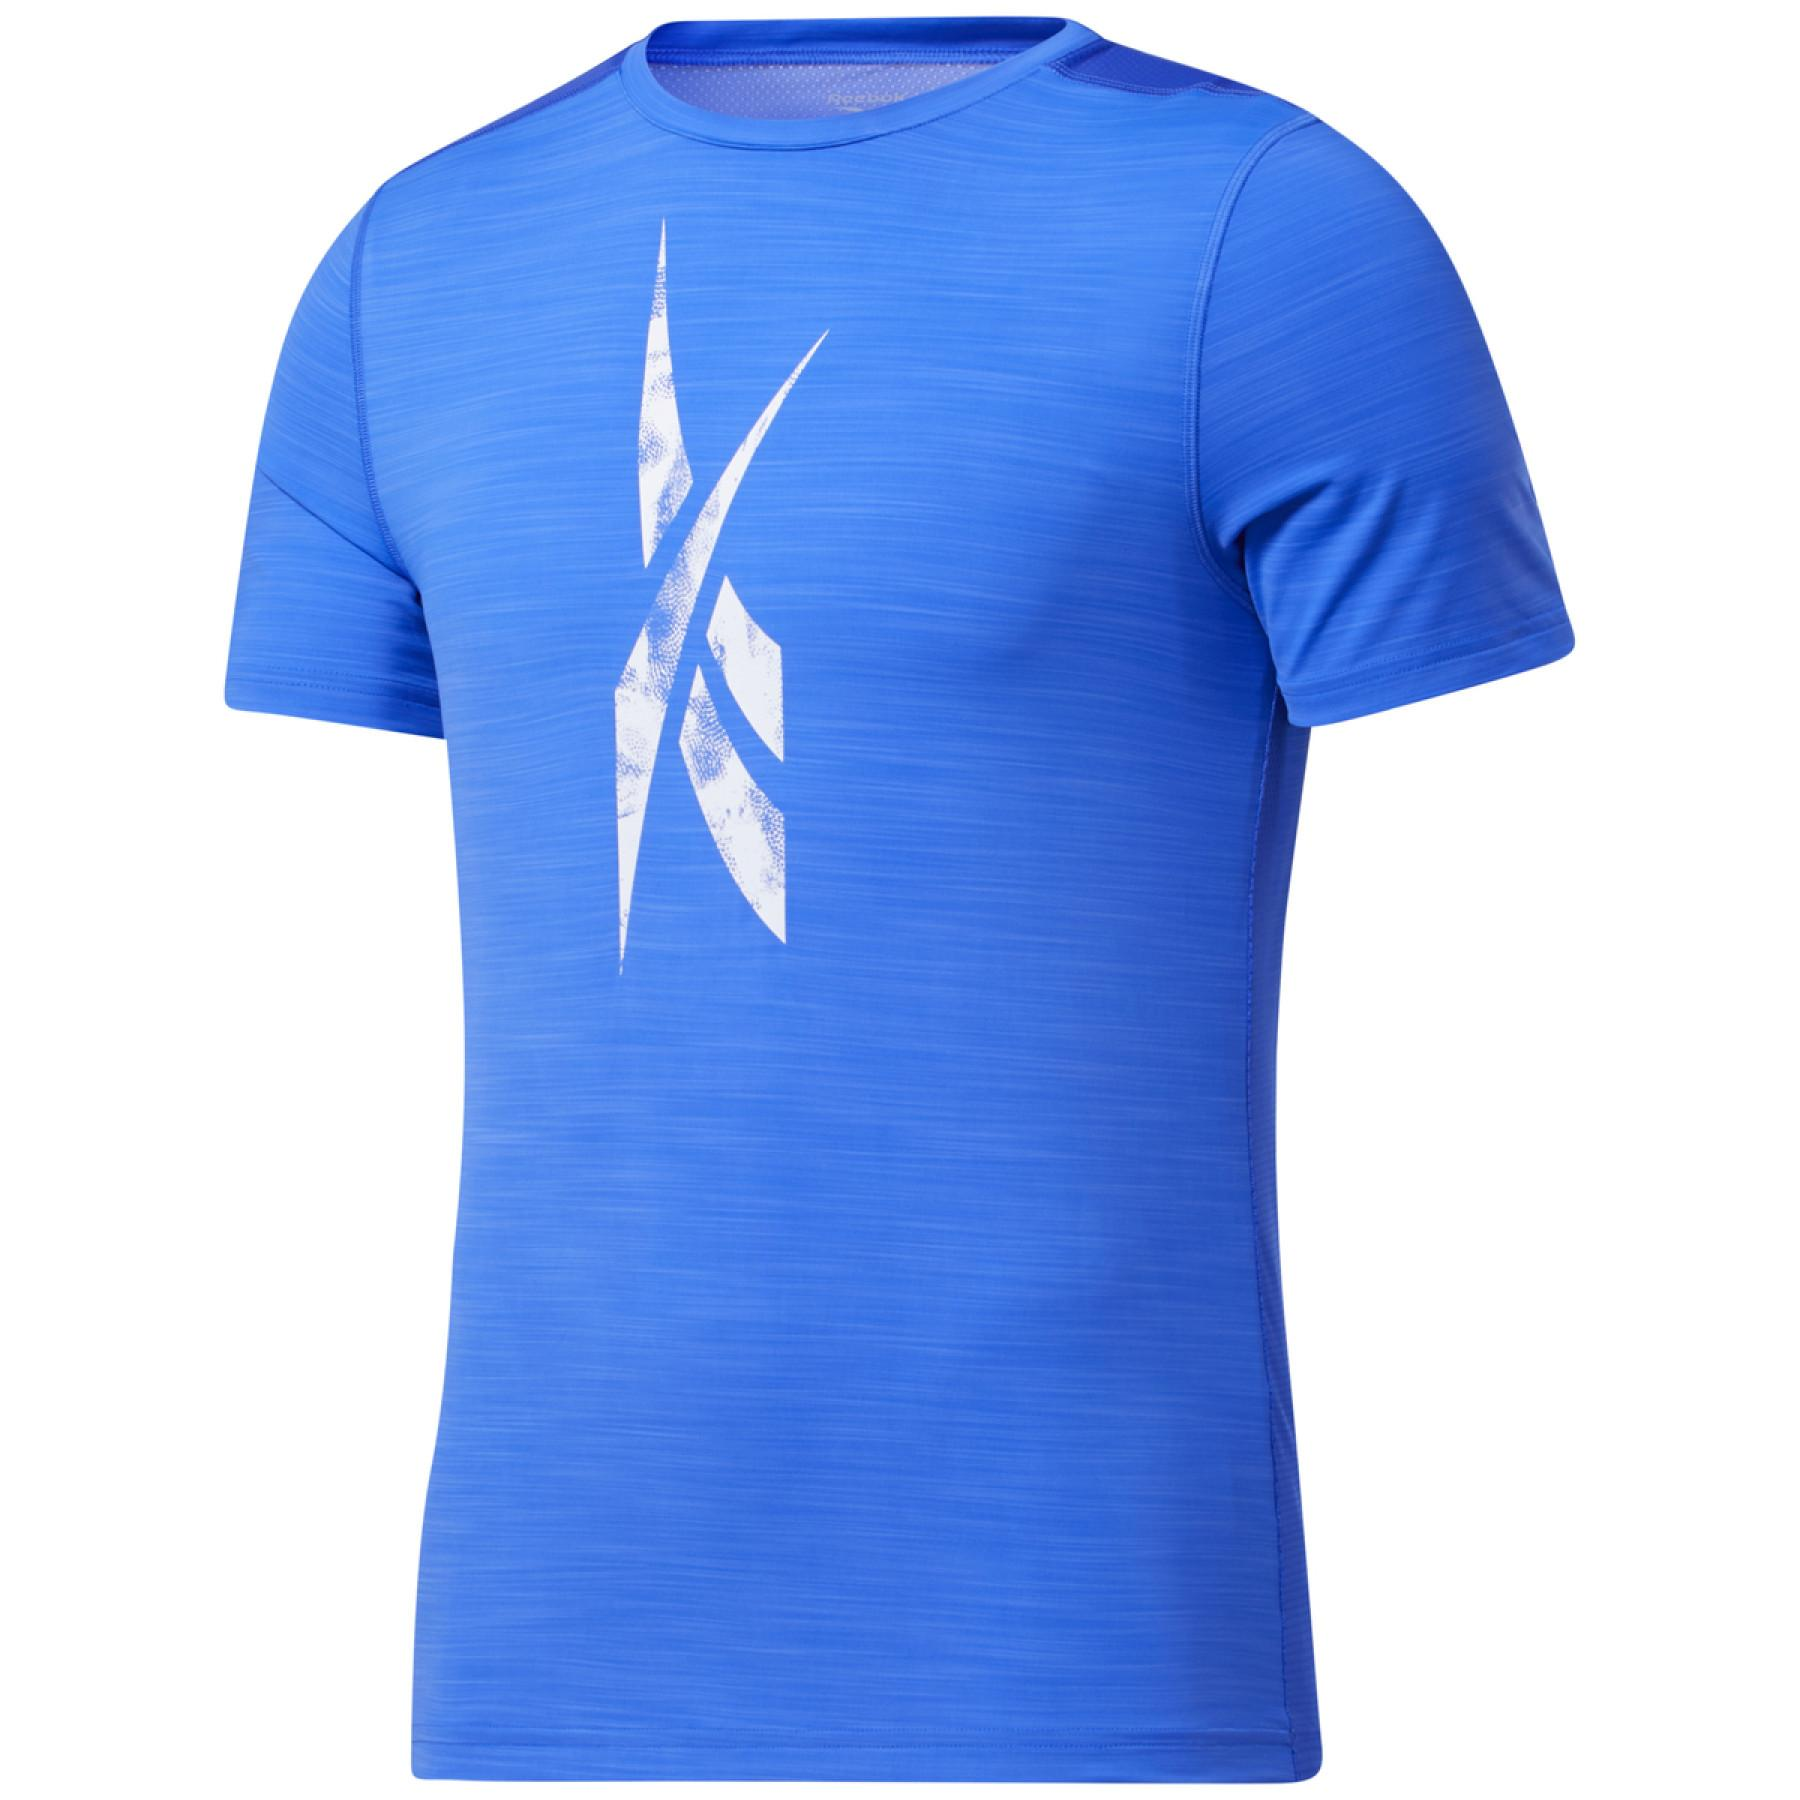 Reebok Workout Ready T-shirt Activchill Graphic